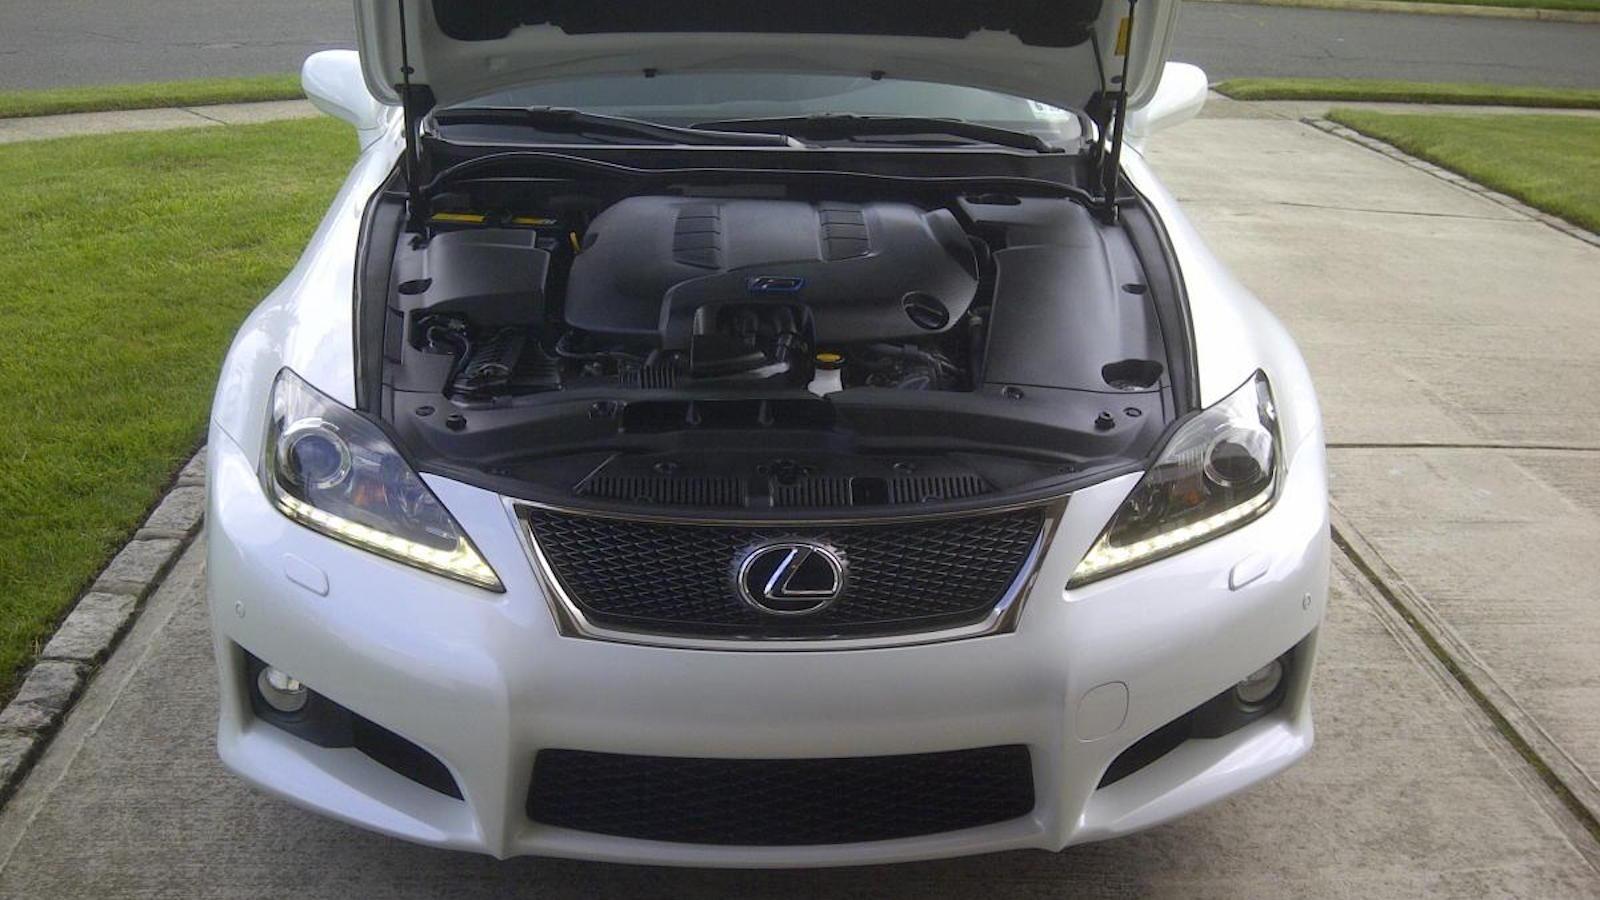 Lexus IS-F Performance Bargain Under 20,000